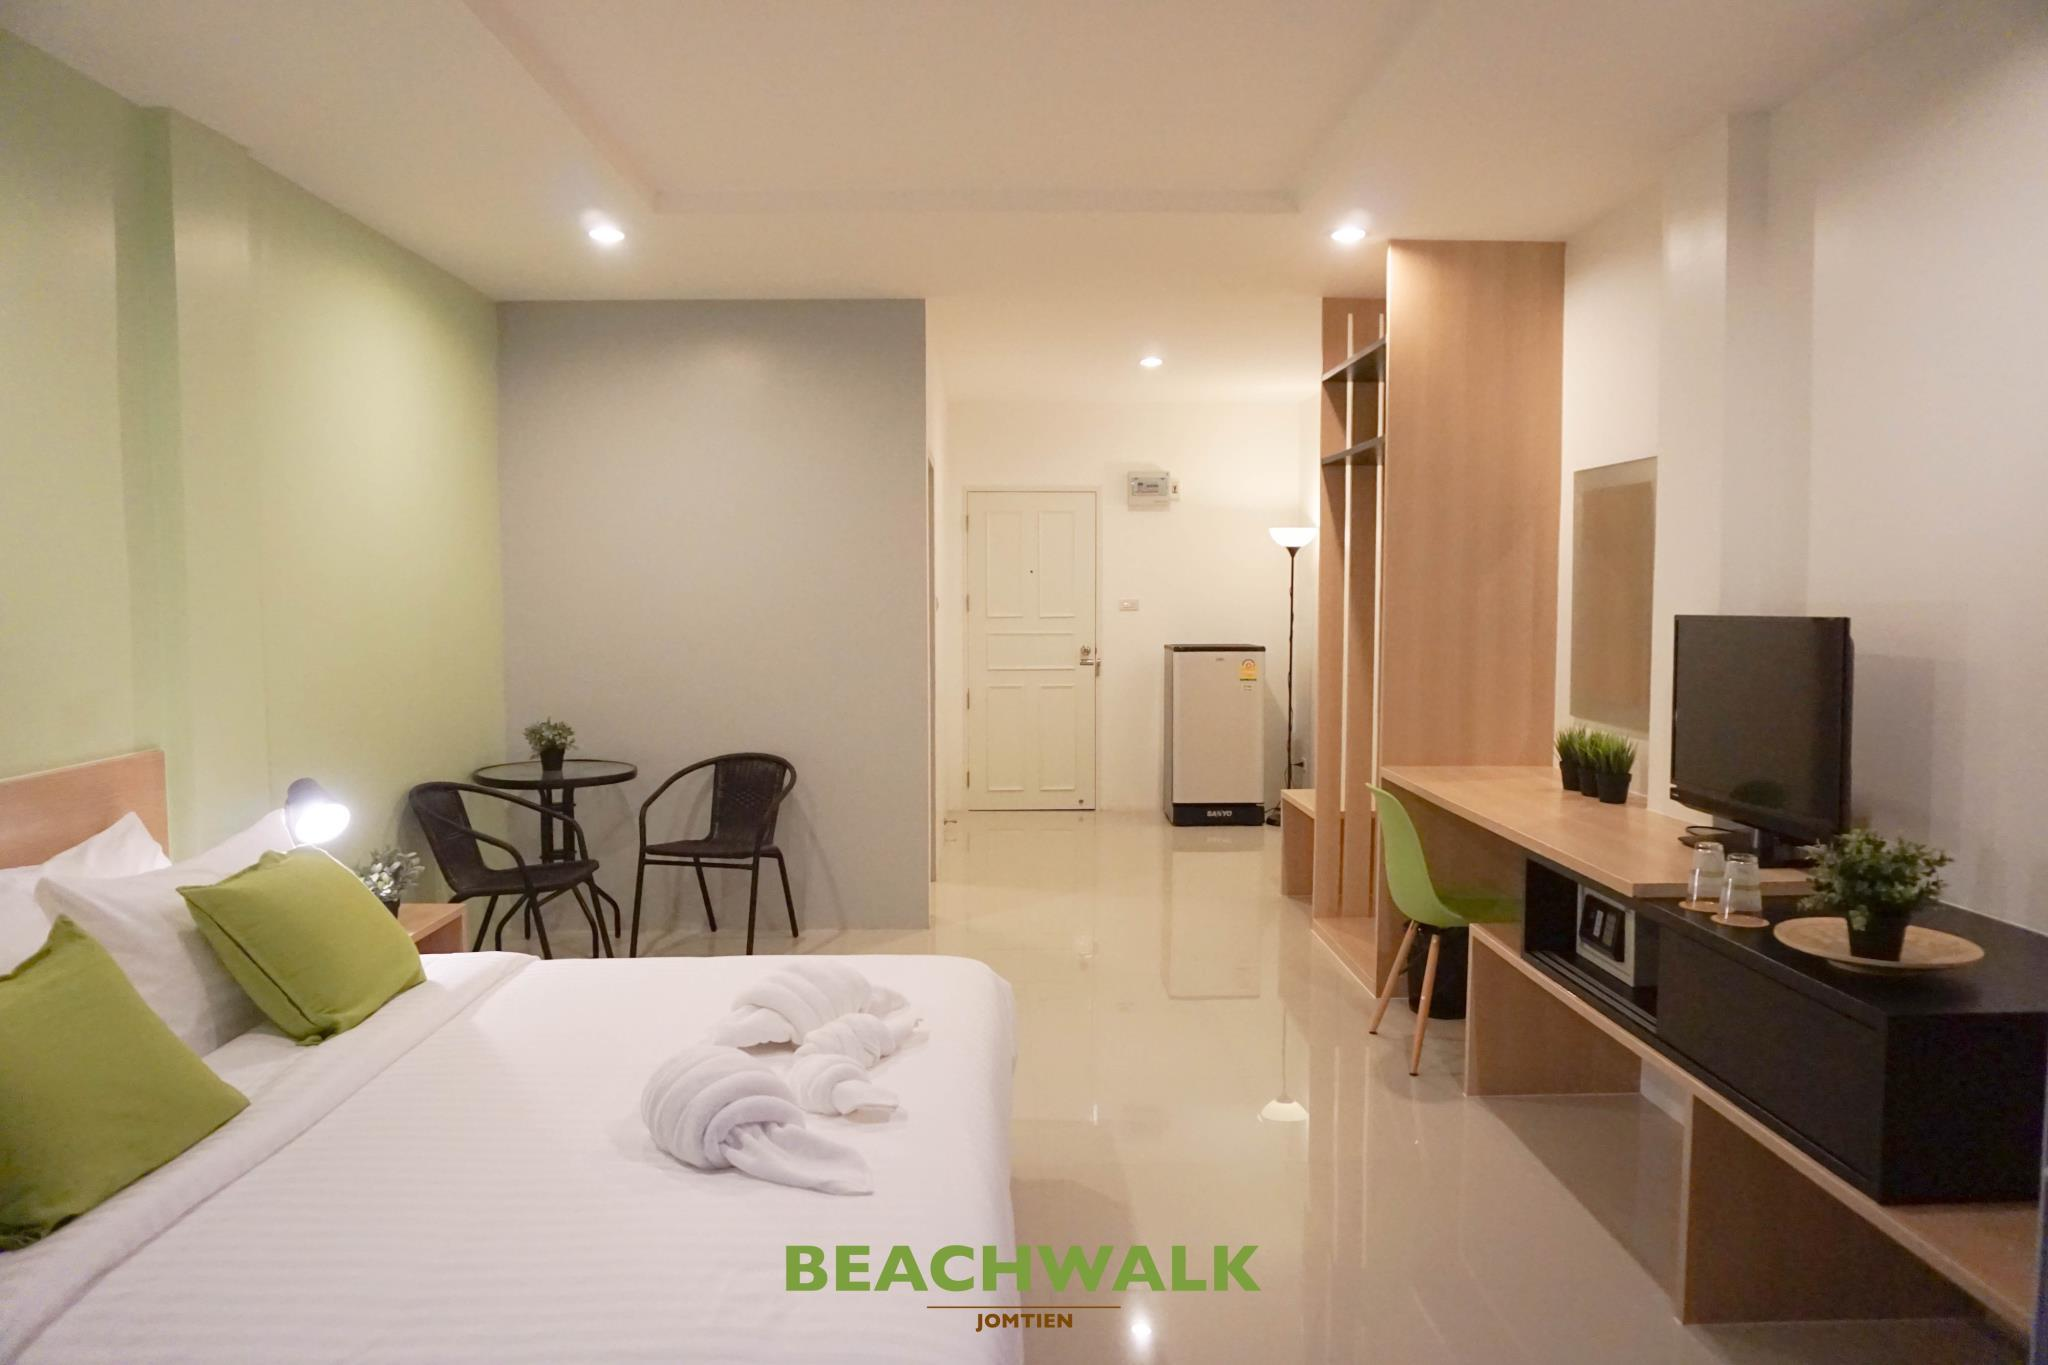 Beachwalk Jomtien - Pattaya